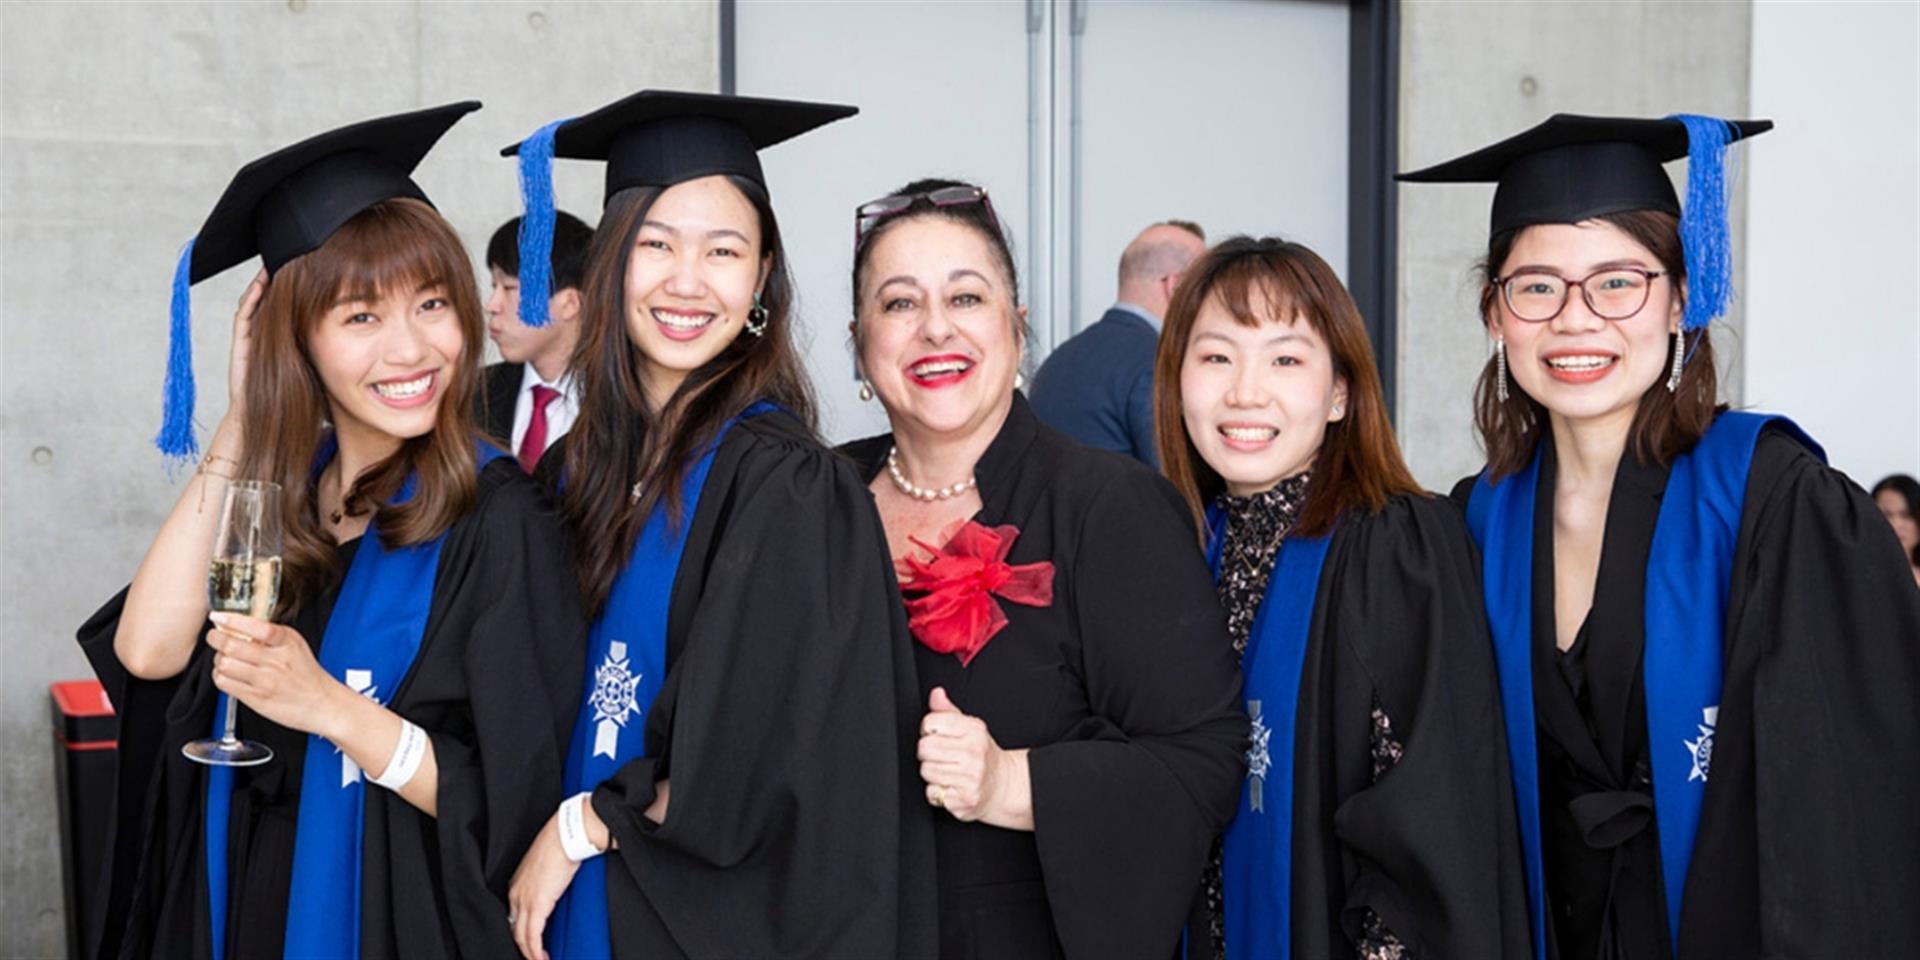 Le Cordon Bleu Australia celebrates student graduations